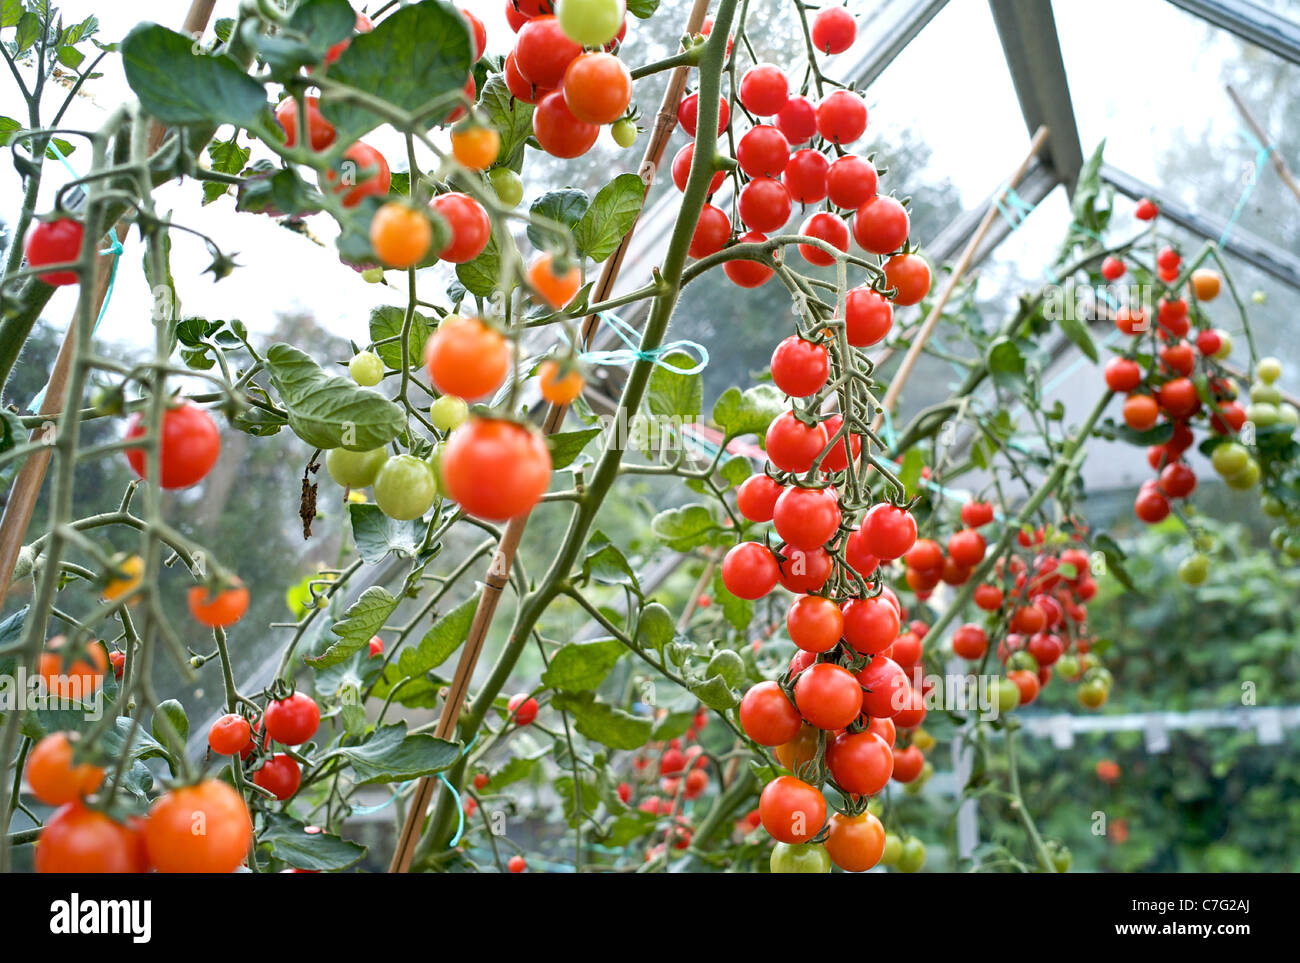 Tomato Growing Growing Vine Tomatoes